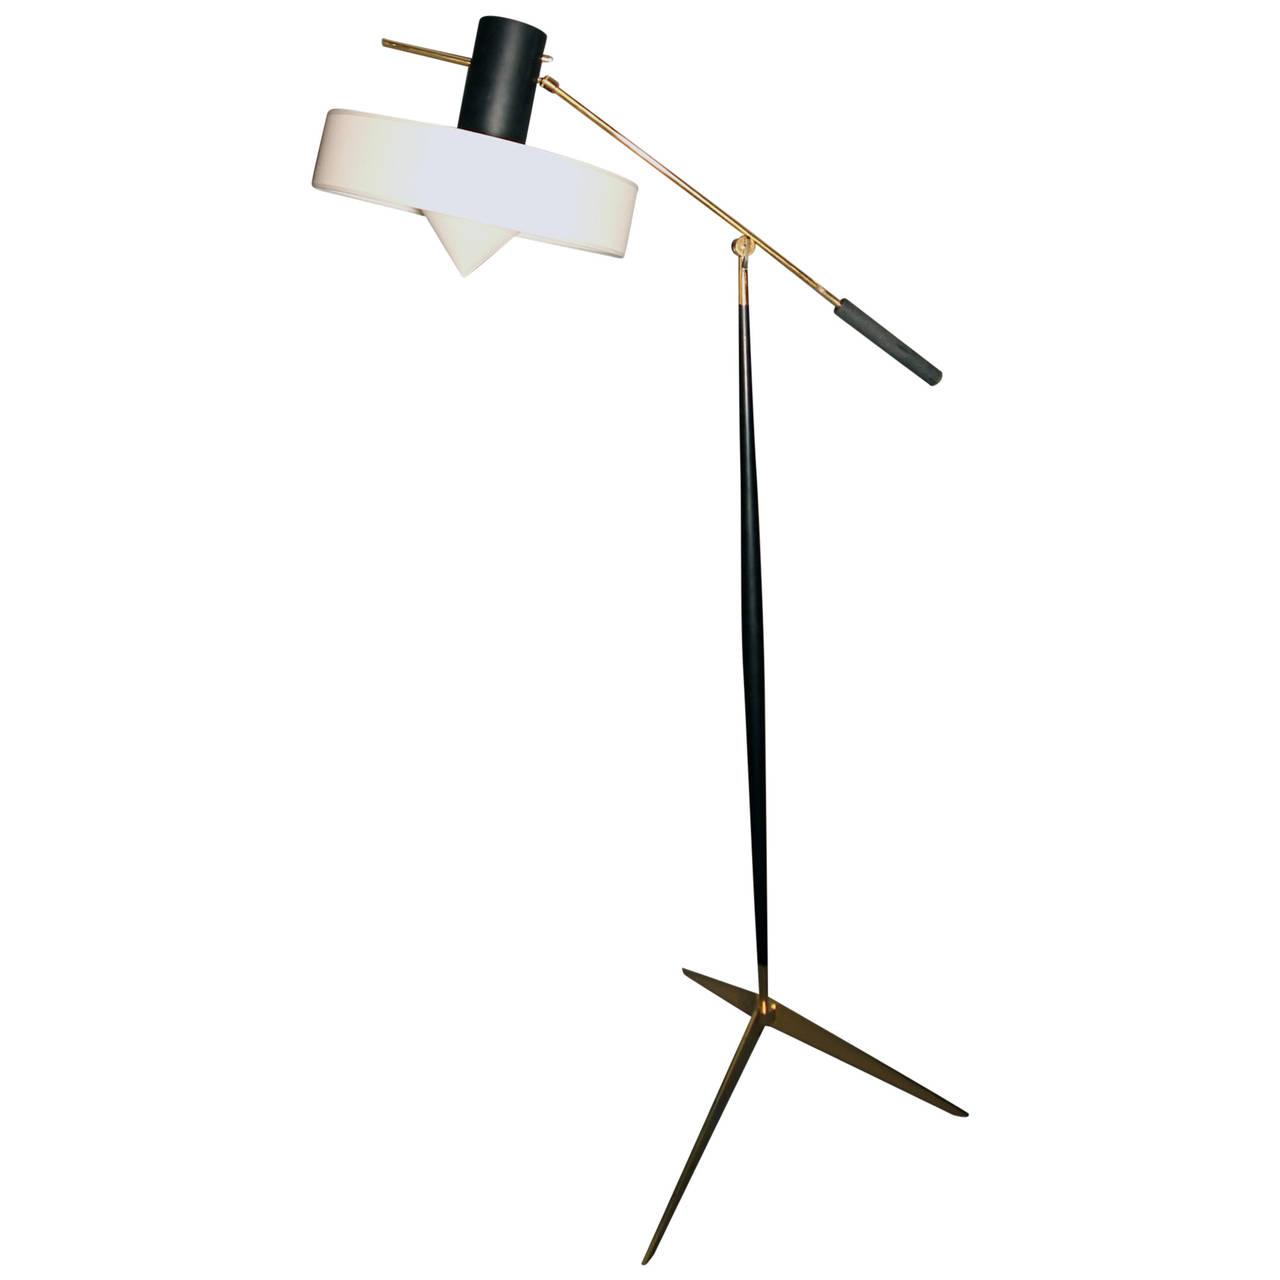 1950s Adjustable Floor Lamp By Lunel